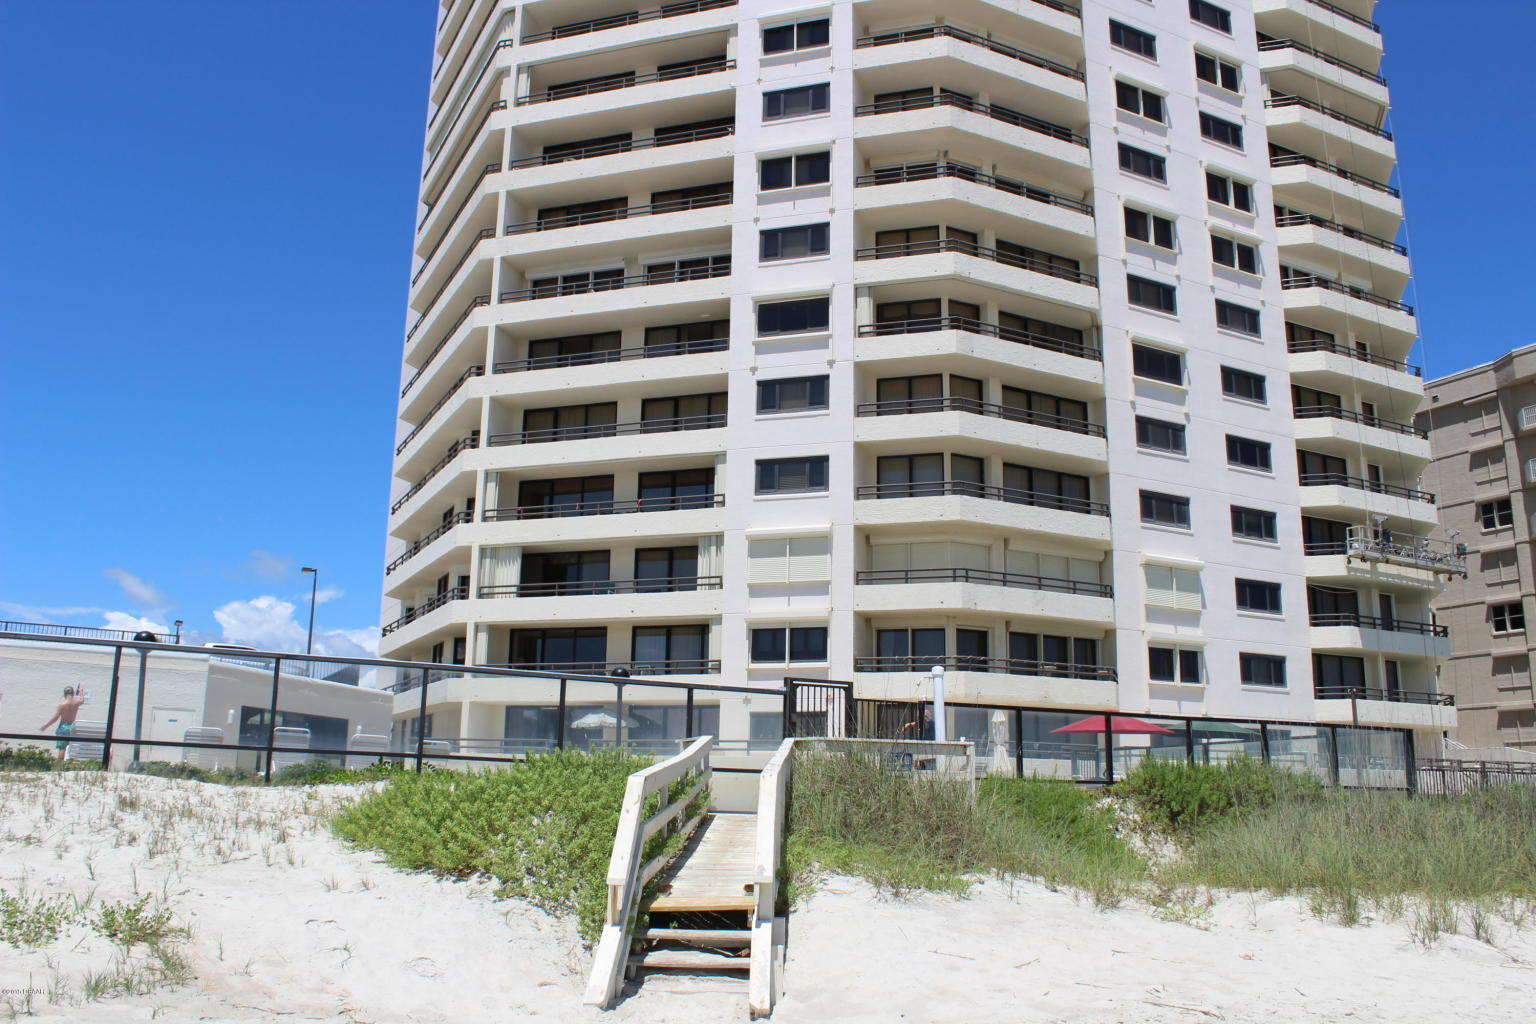 seychelles ocean front condos daytona beach for sale